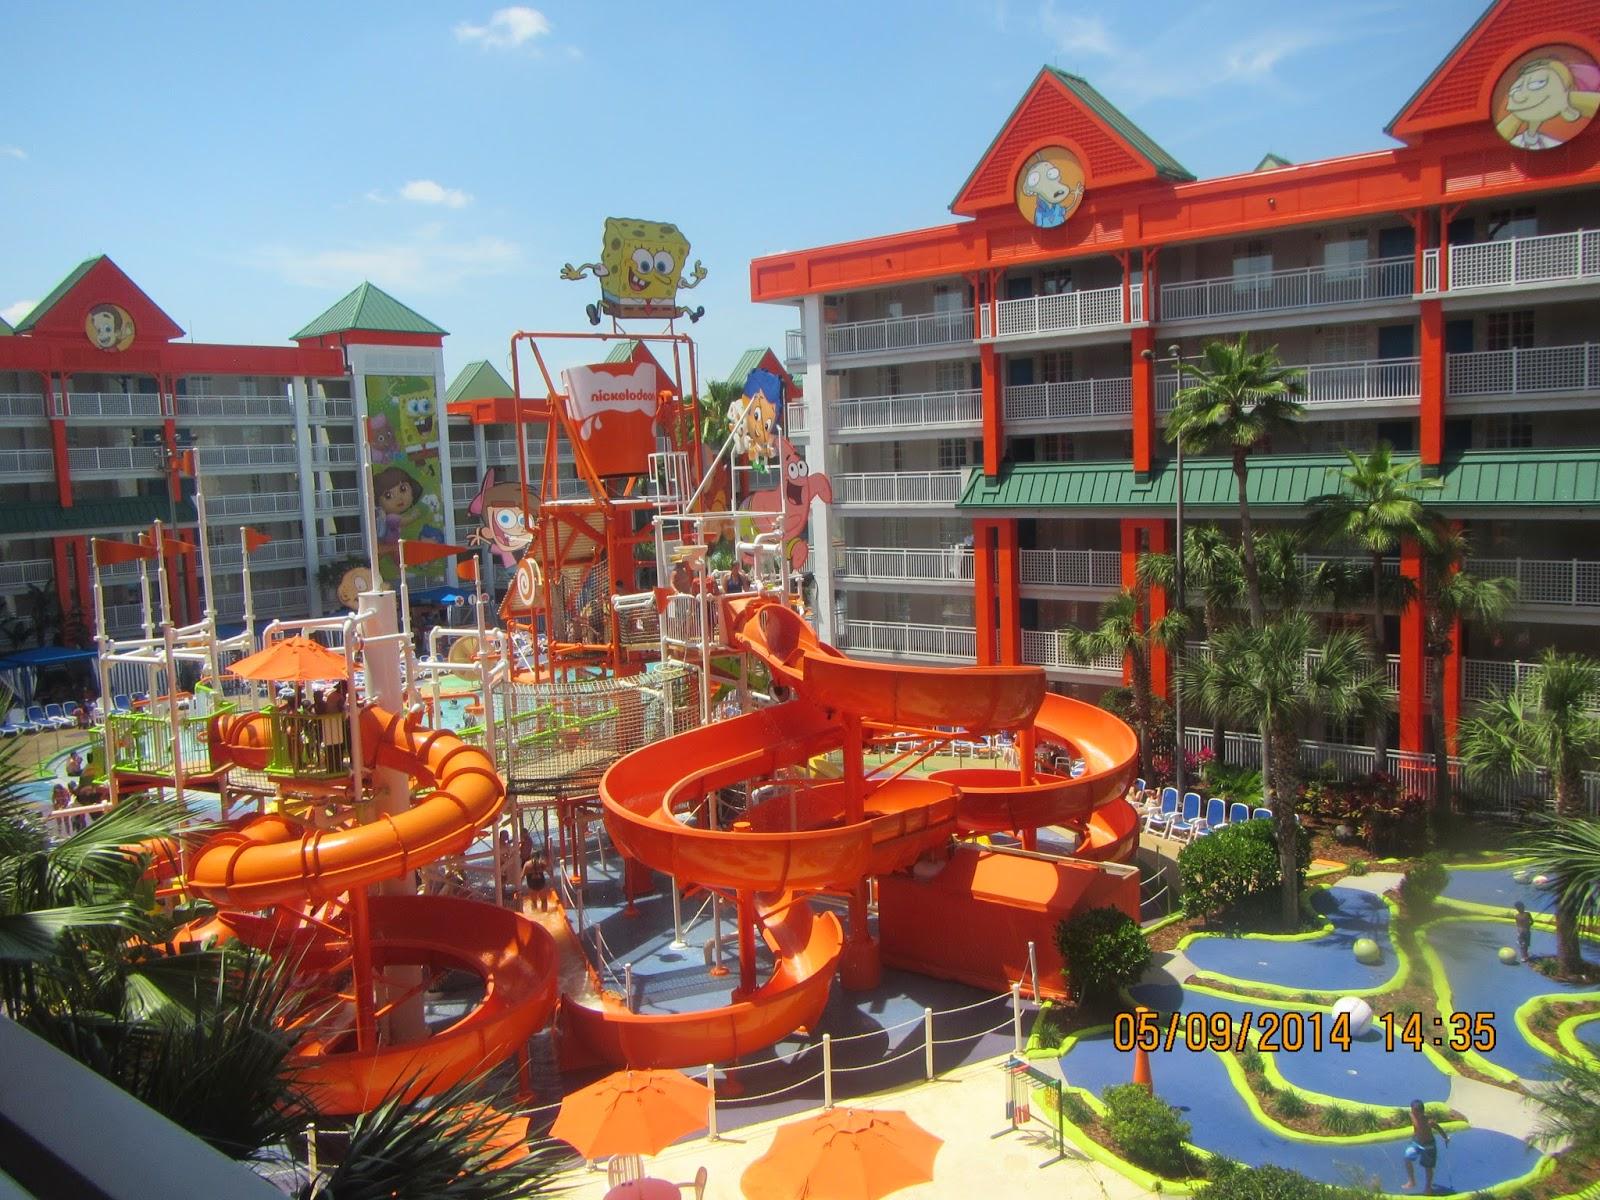 Park Inn Hotel Bielefeld Google Maps